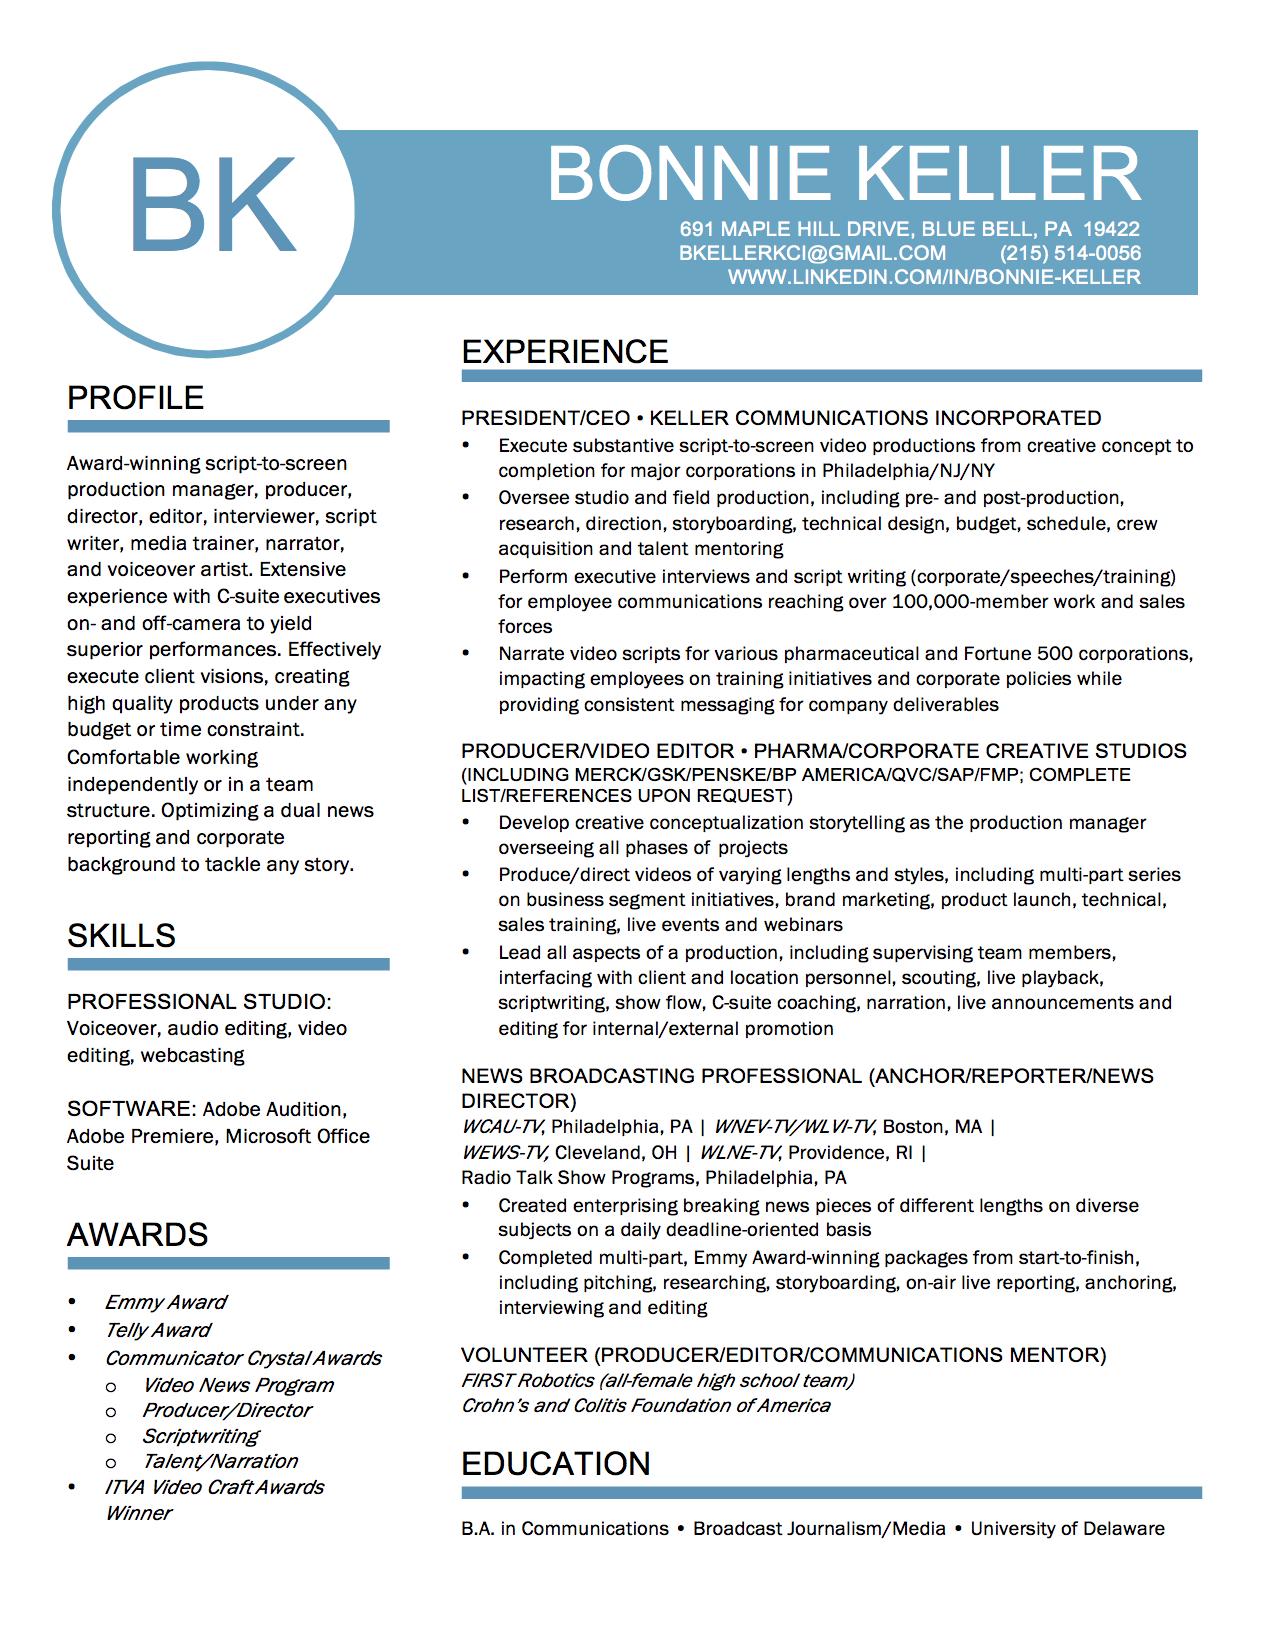 Resume | Keller Communications Inc